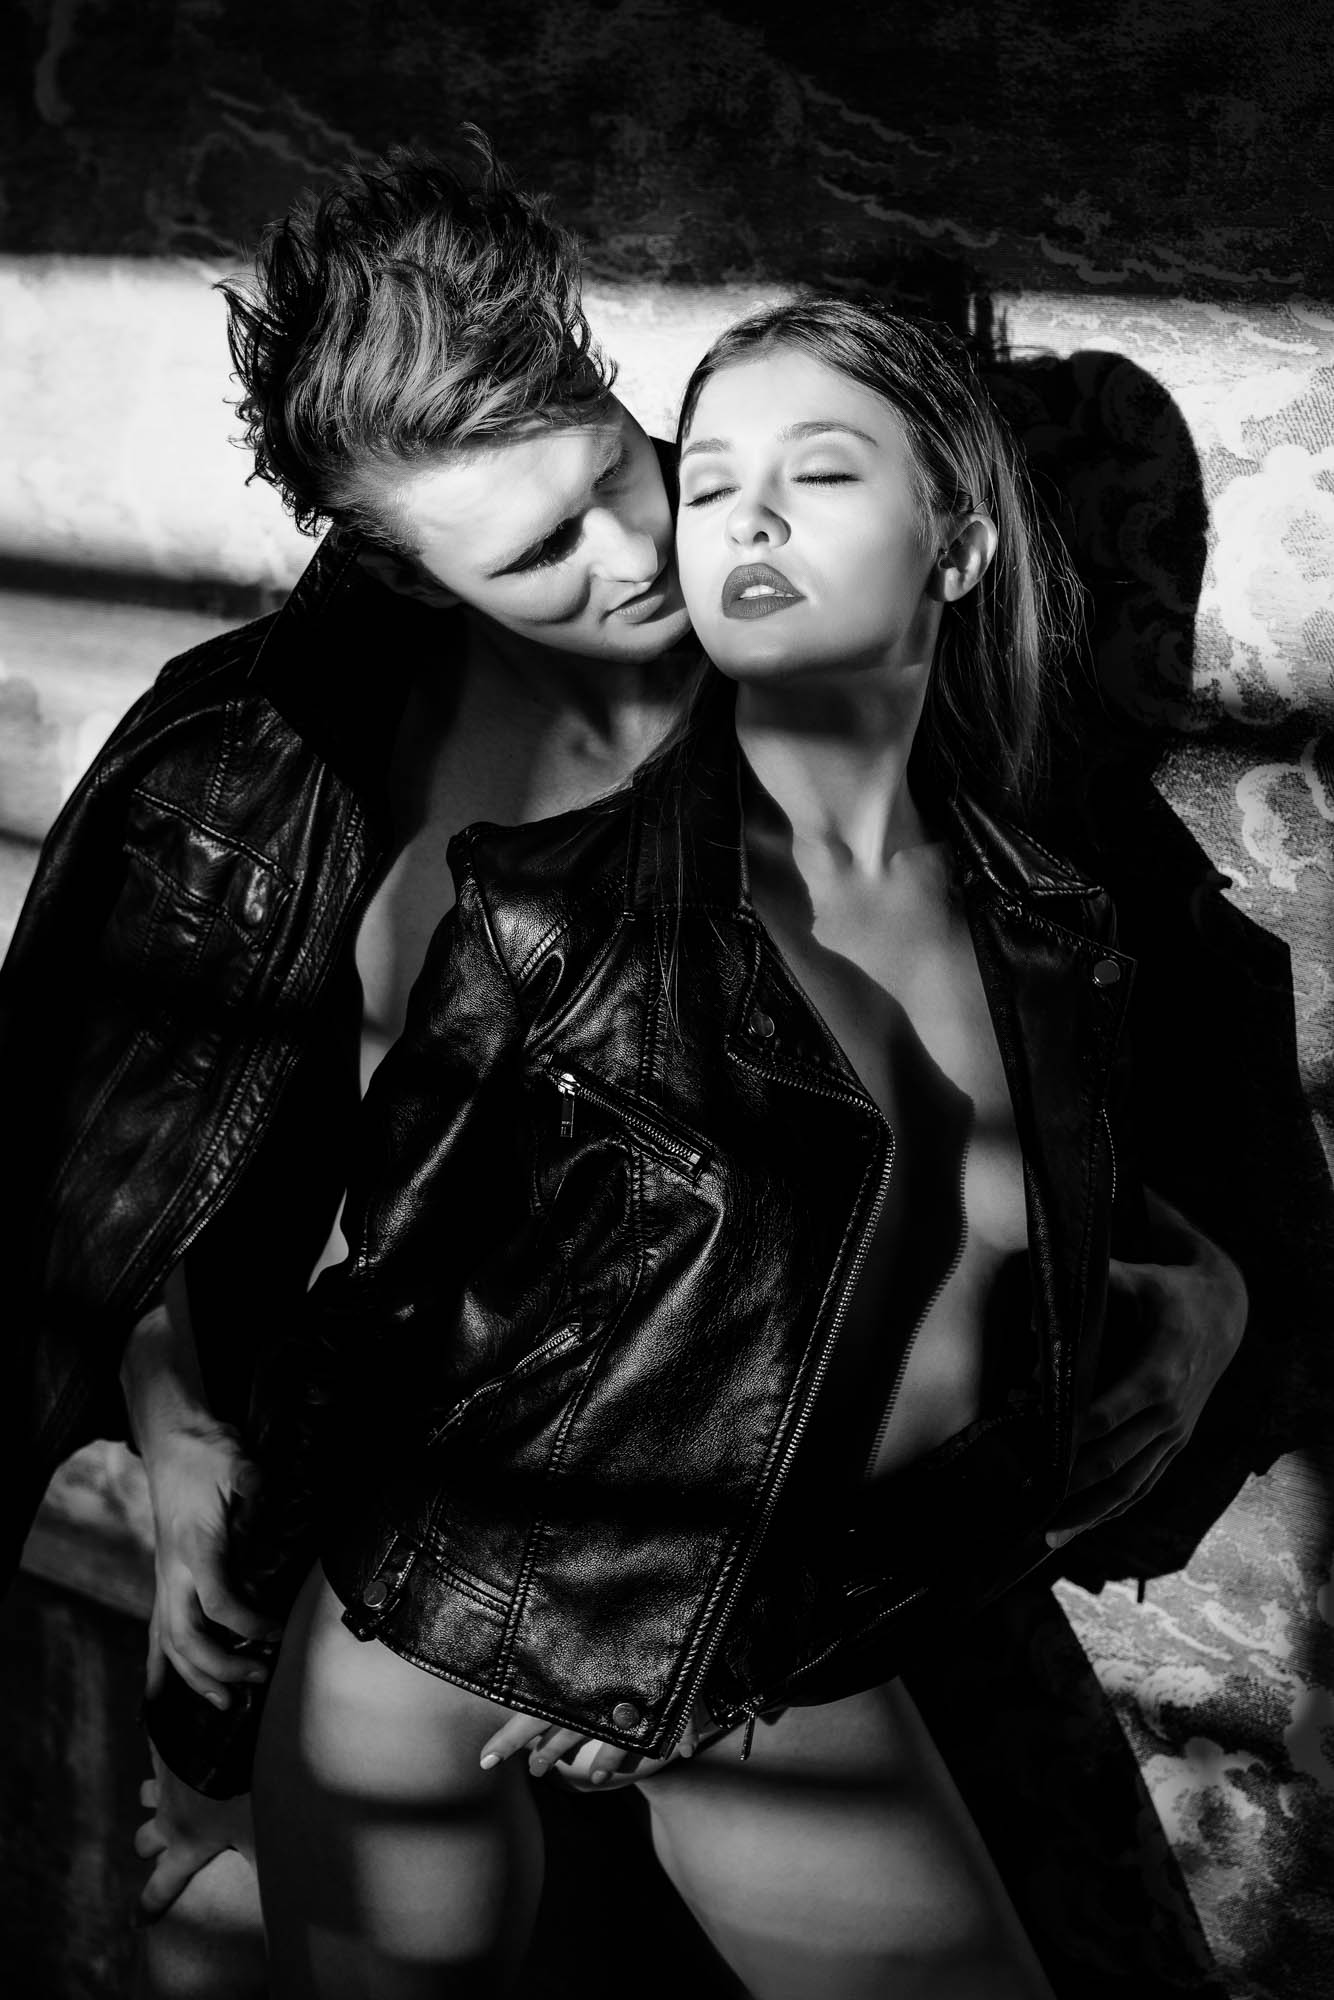 Lex & Josh Calvin Klein B&W Nude Intimate Shoot with Magnus & Olya-15.jpg